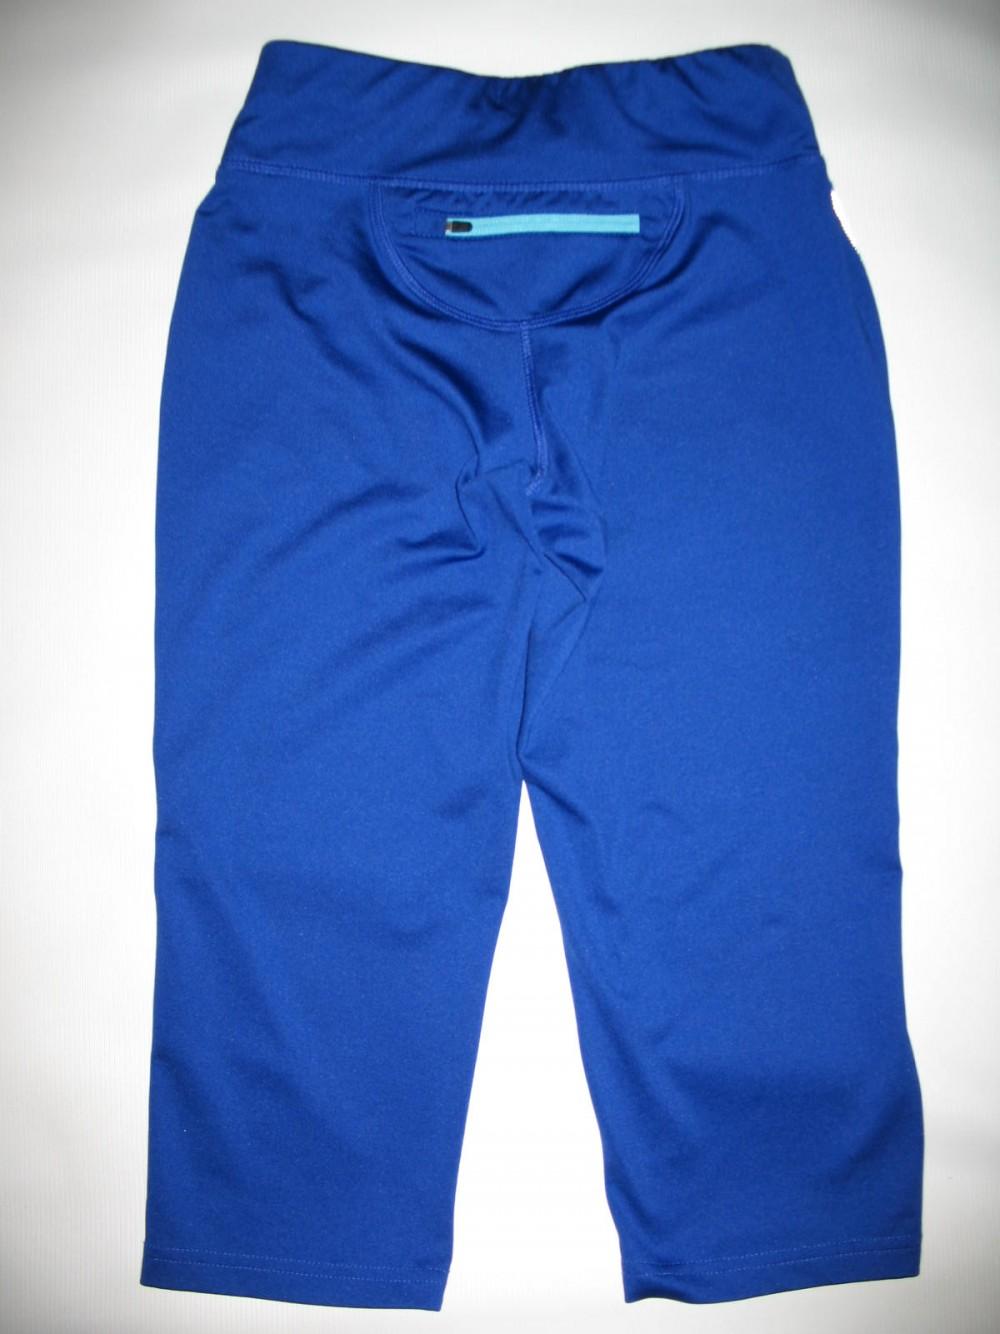 Шорты CRIVIT 3/4 shorts lady (размер S/М(38-40)) - 1